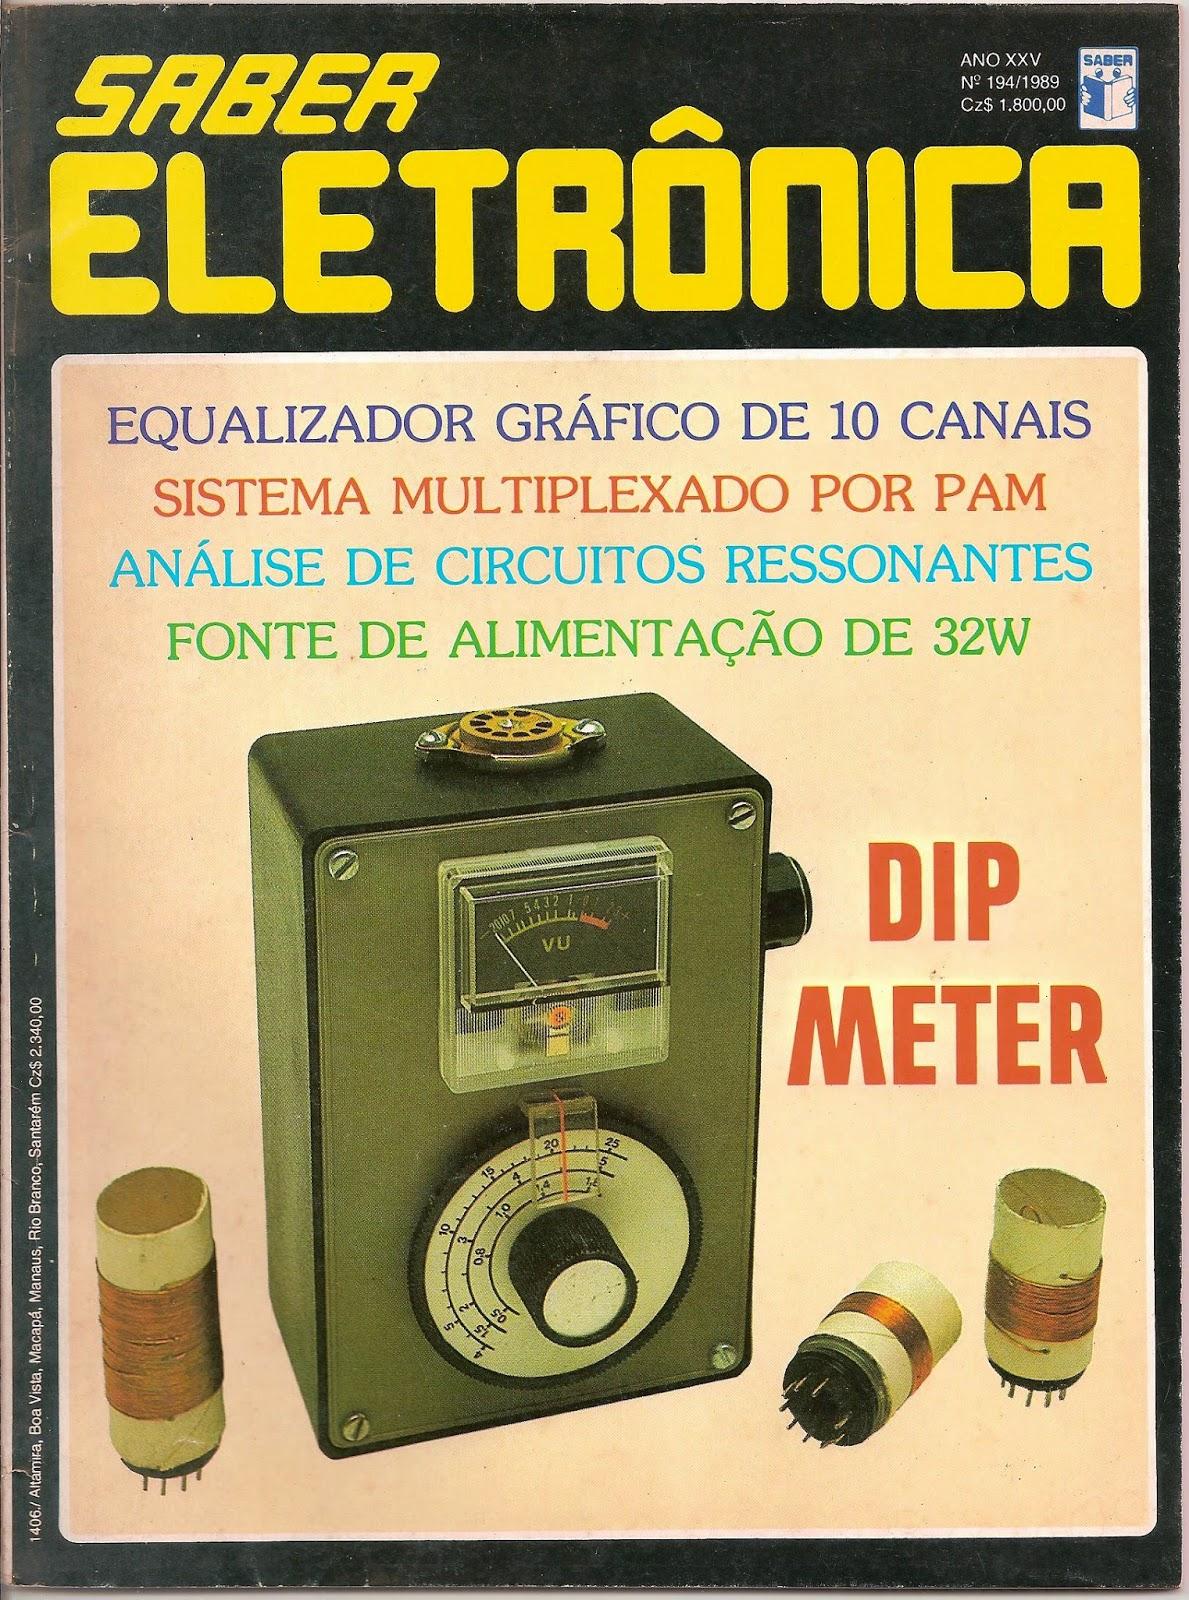 Preferência FDI - FIRMWARE, DESIGN and INNOVATION: Transmissor PX-FM - Janeiro  MW35